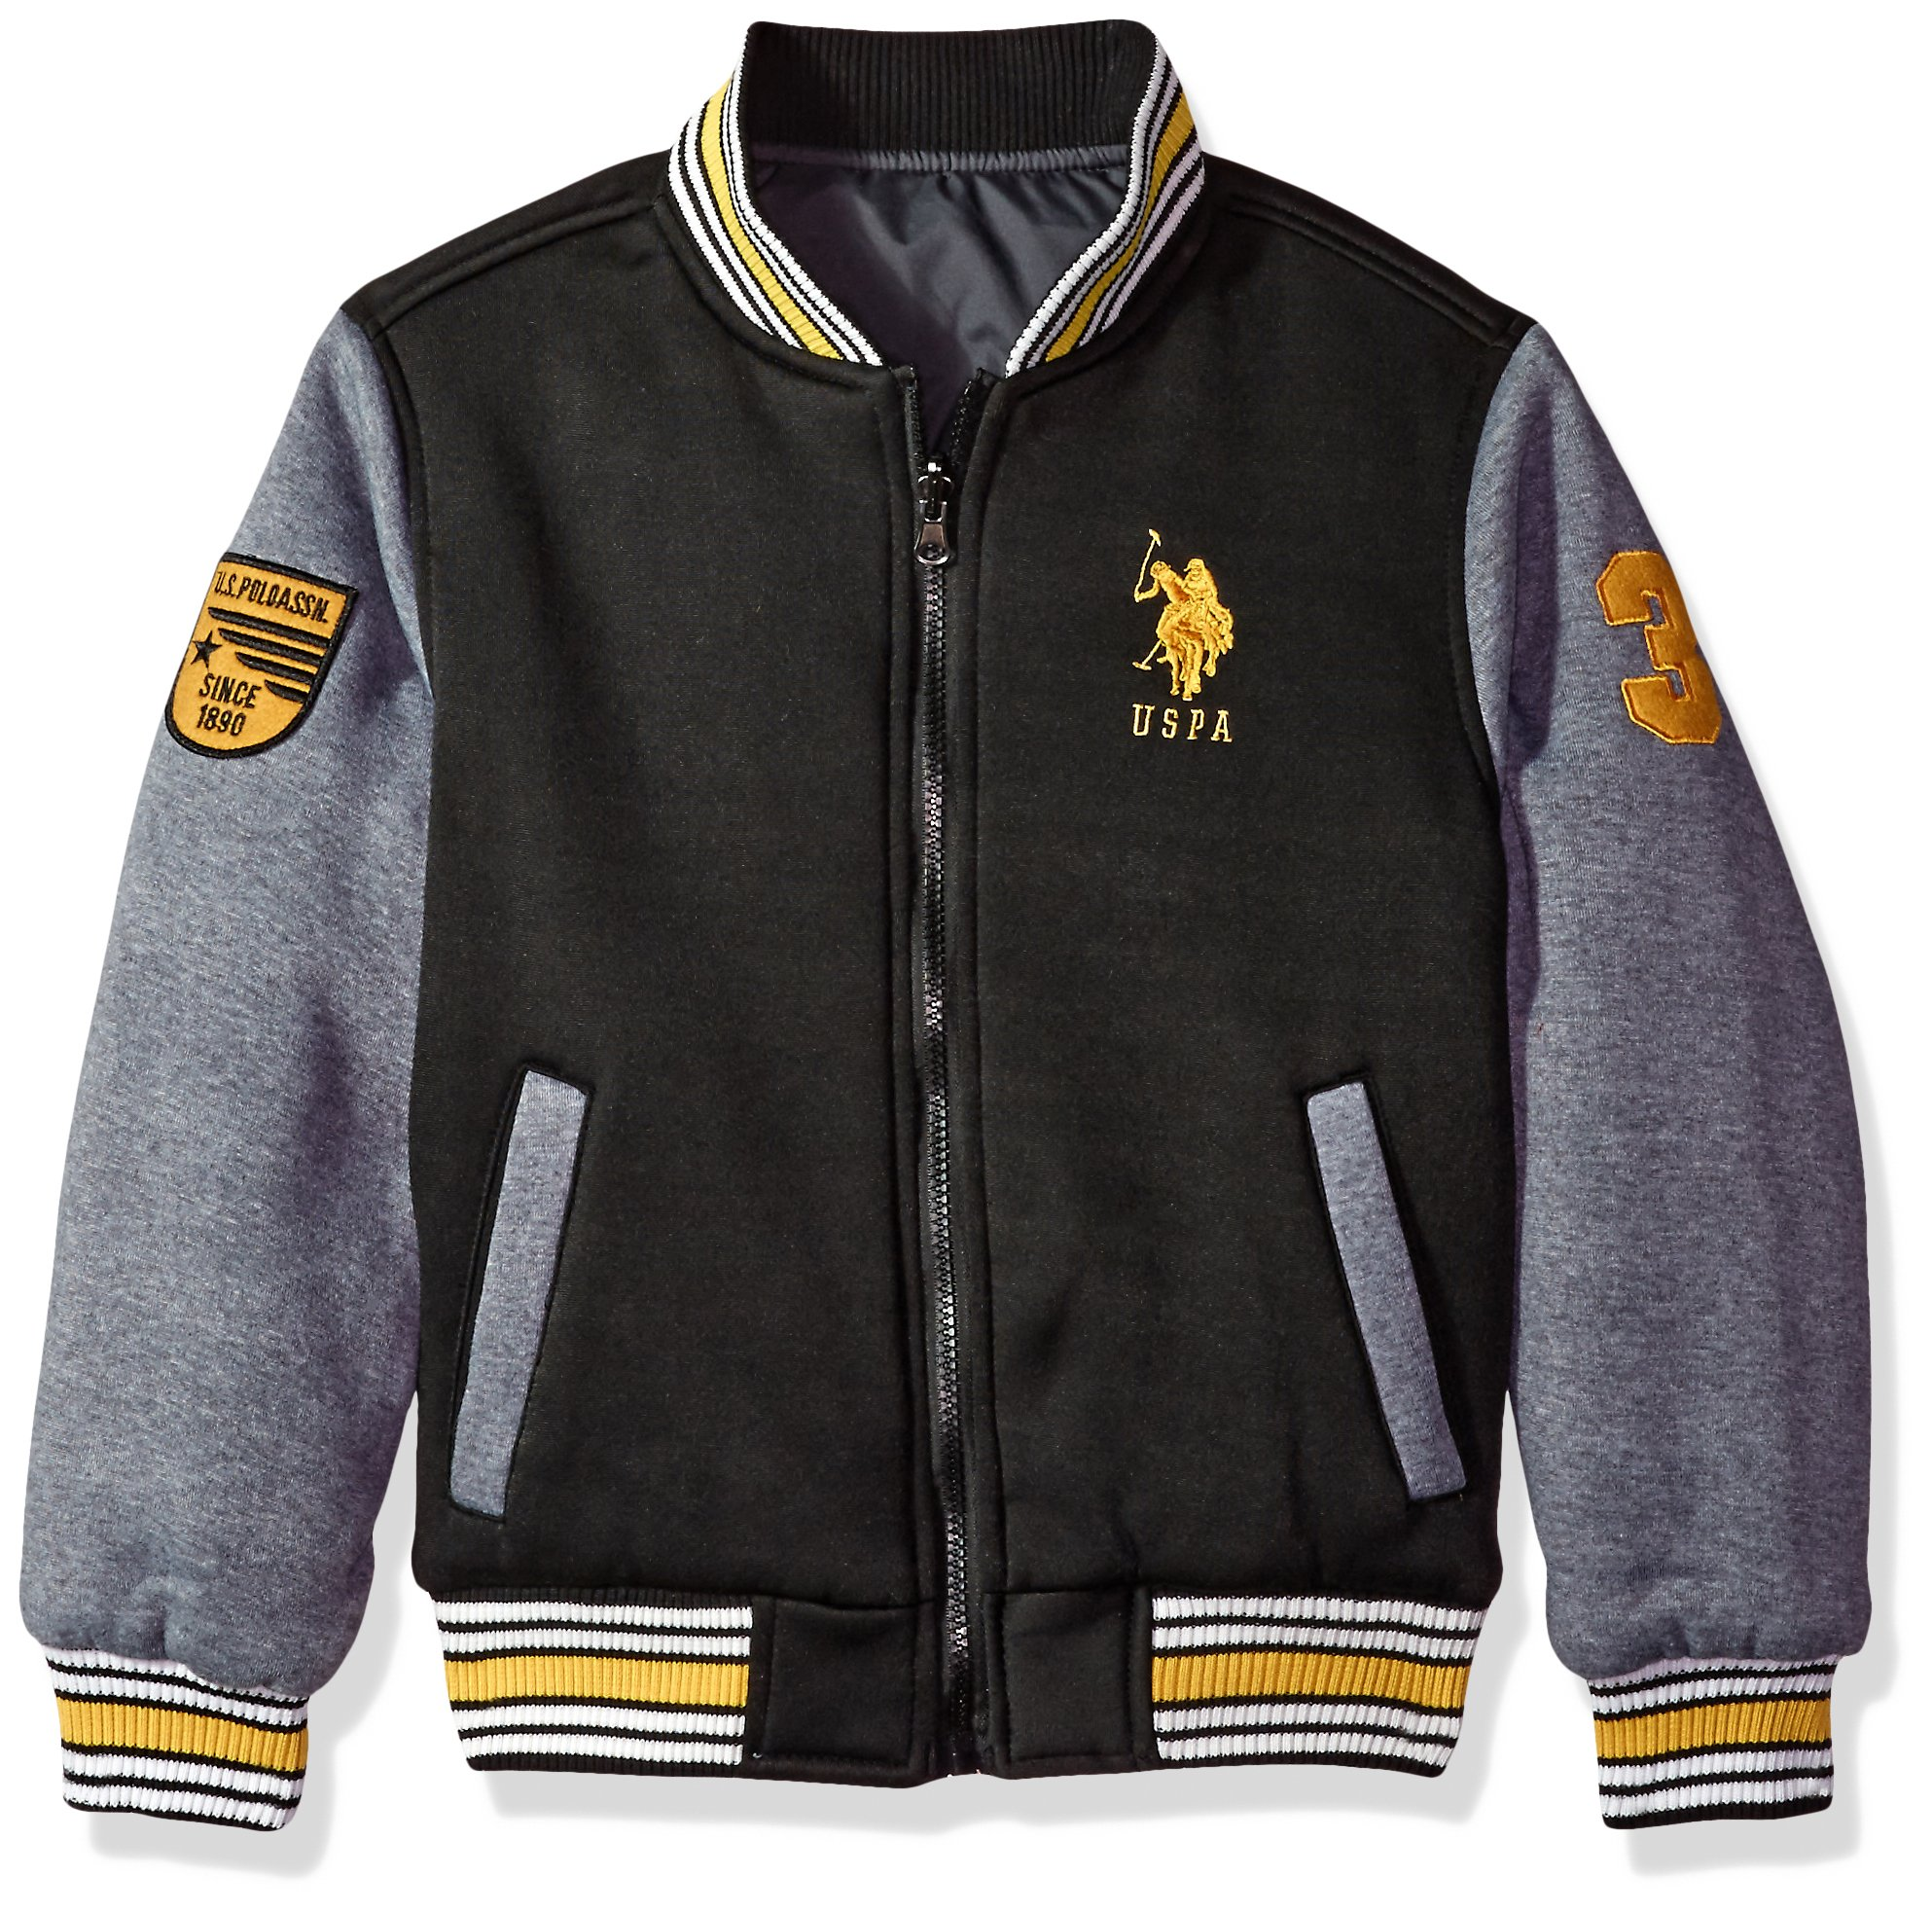 US Polo Association Big Boys' Fashion Outerwear Jacket, UB59-Reversible-Black/Heather Grey, 10/12